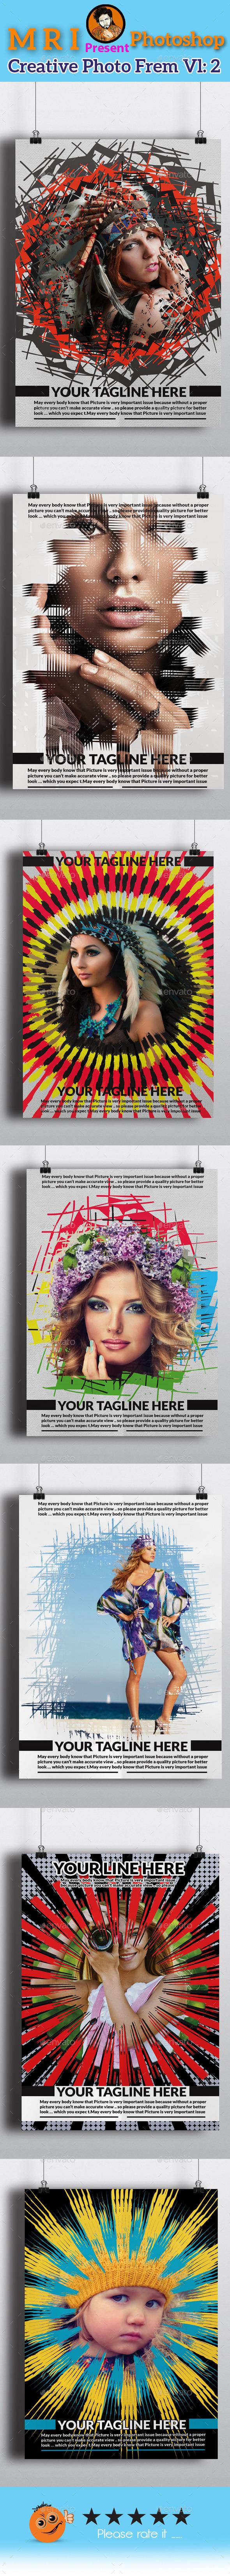 Creative Photo Frame Vl 2 - Photo Templates Graphics